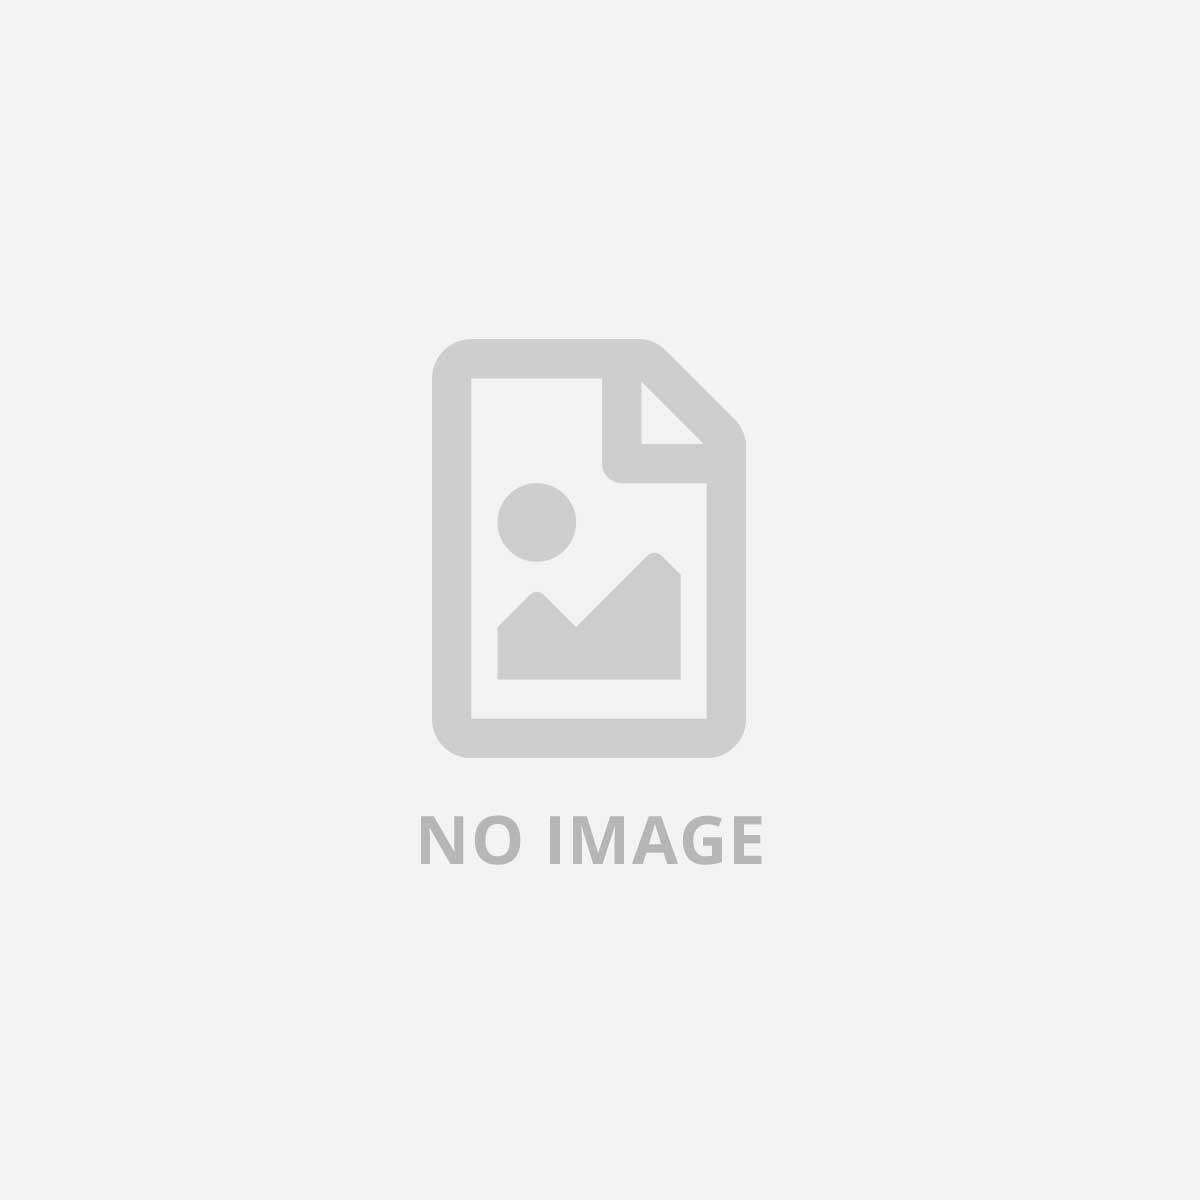 BLACK AND DECKER BLACKDECKER SET ALCALINE